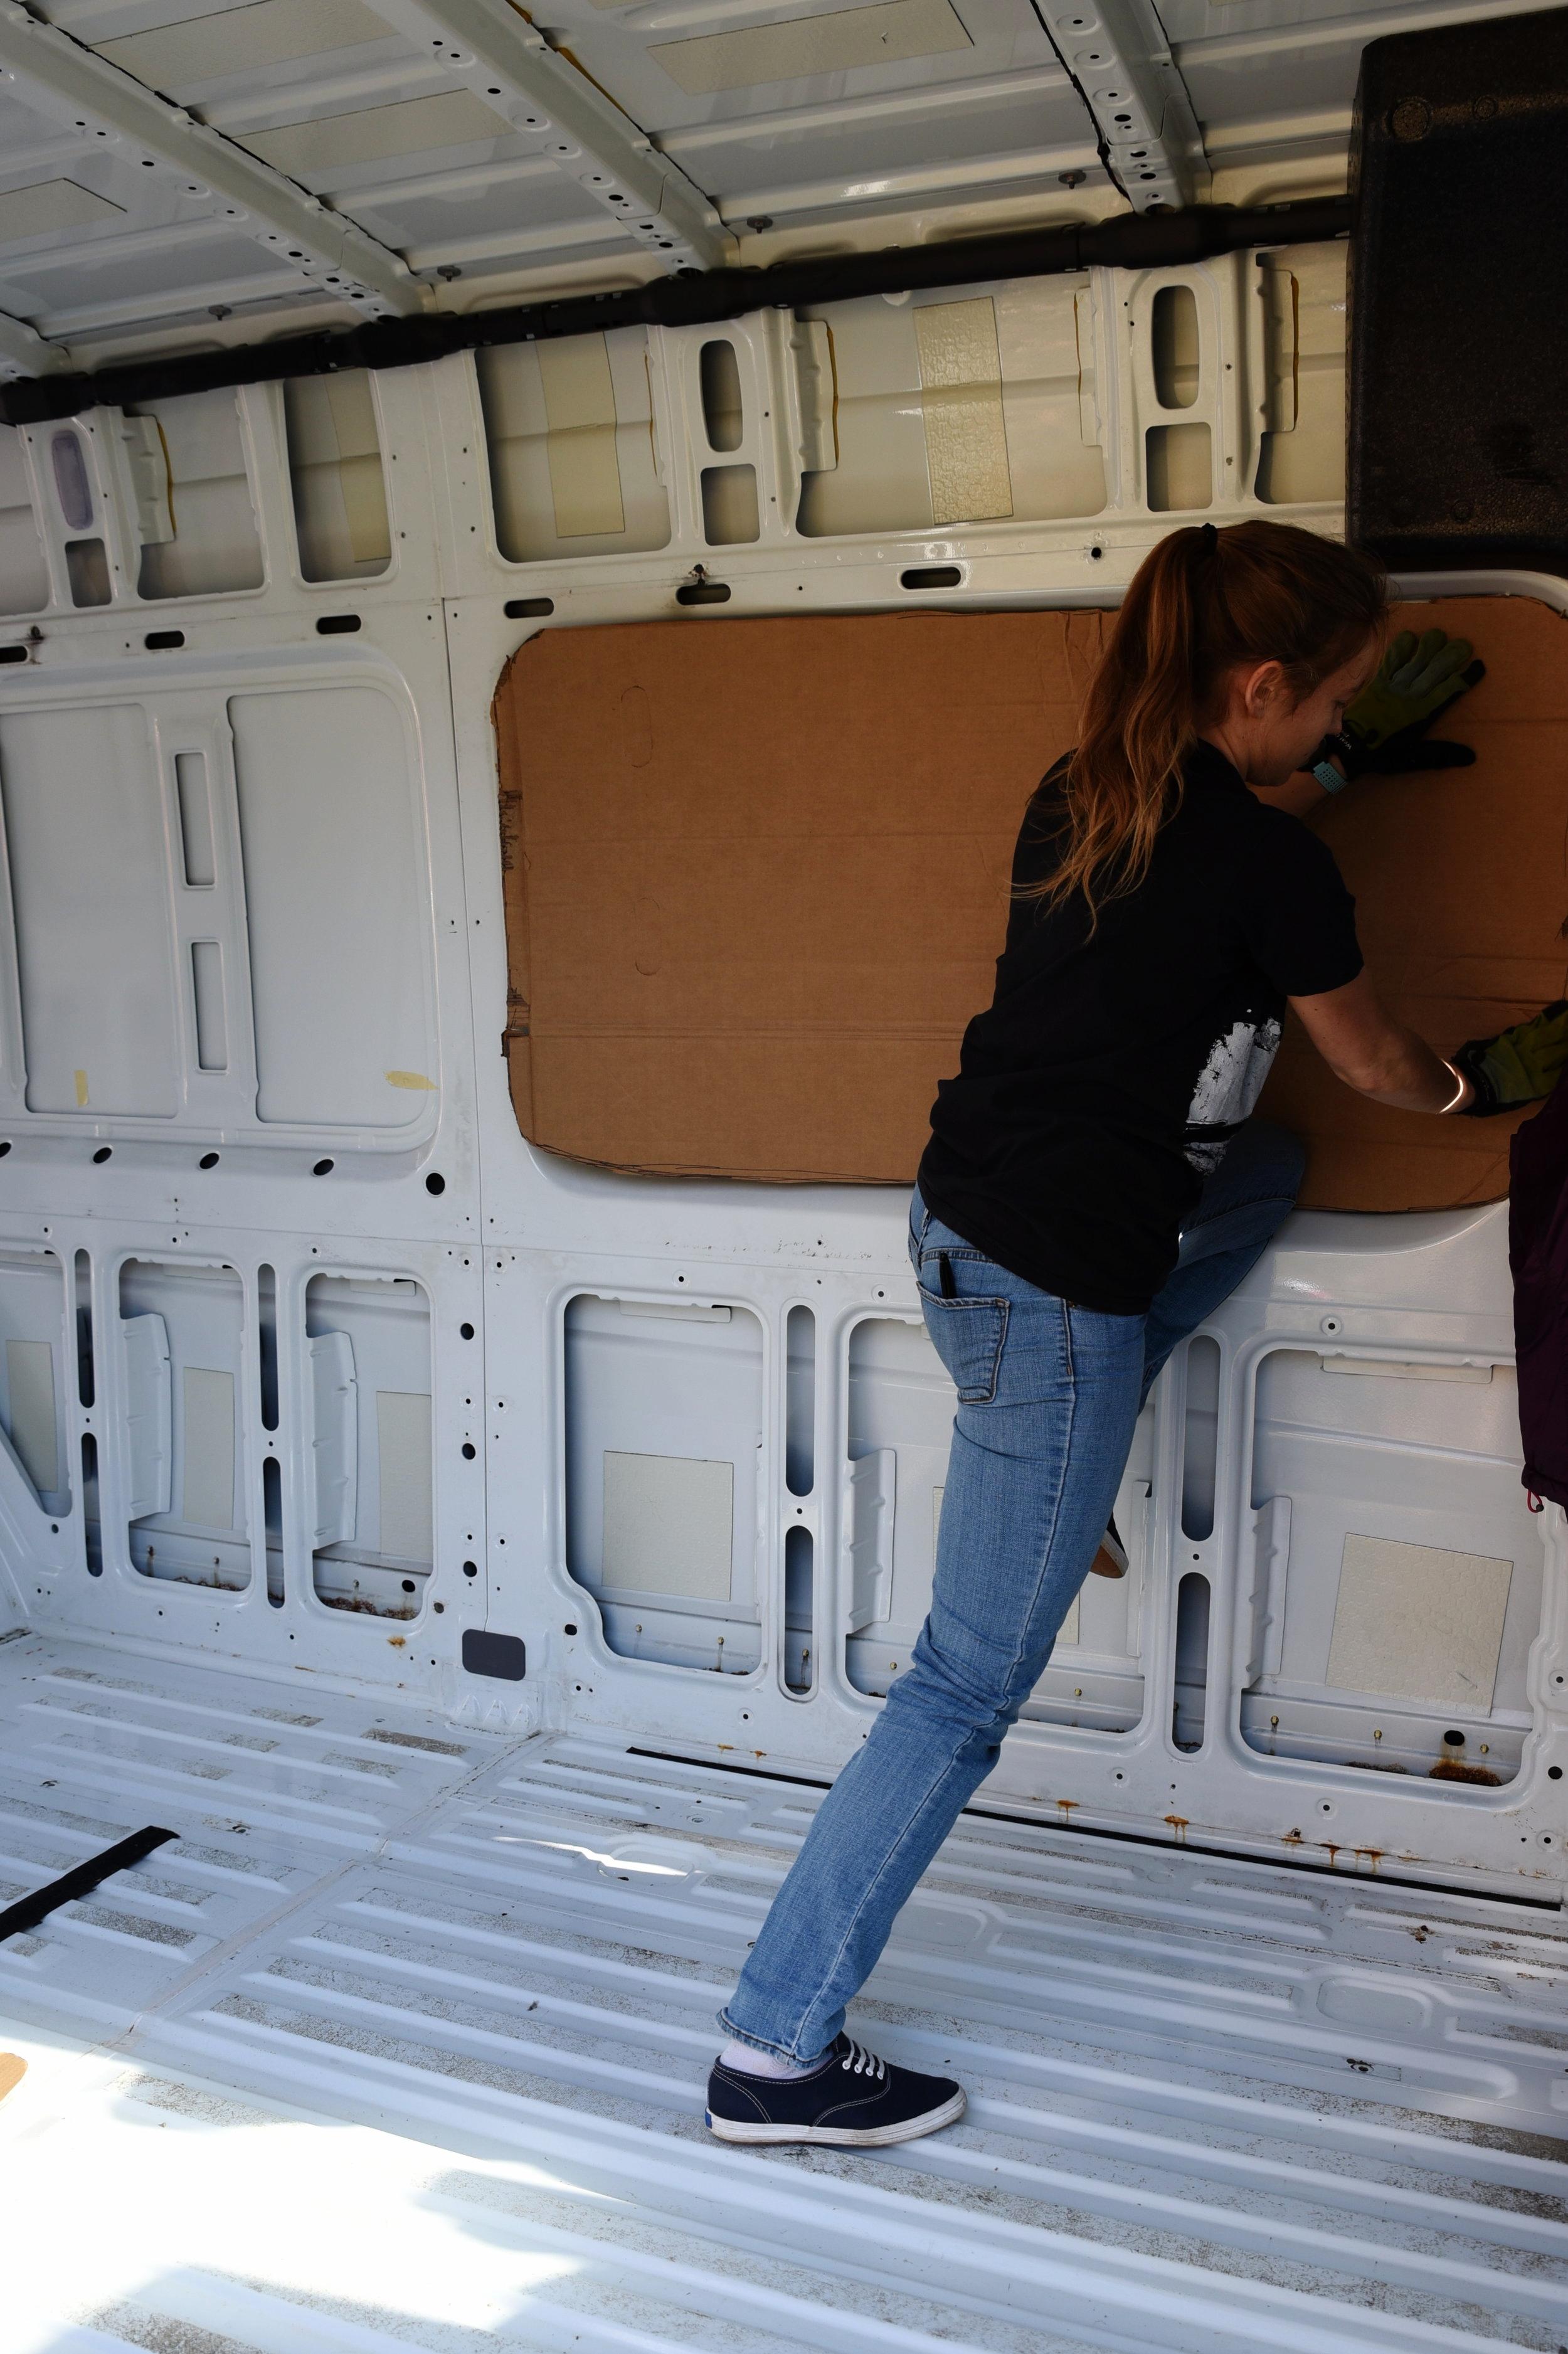 Kaylee test fits the template inside the van.